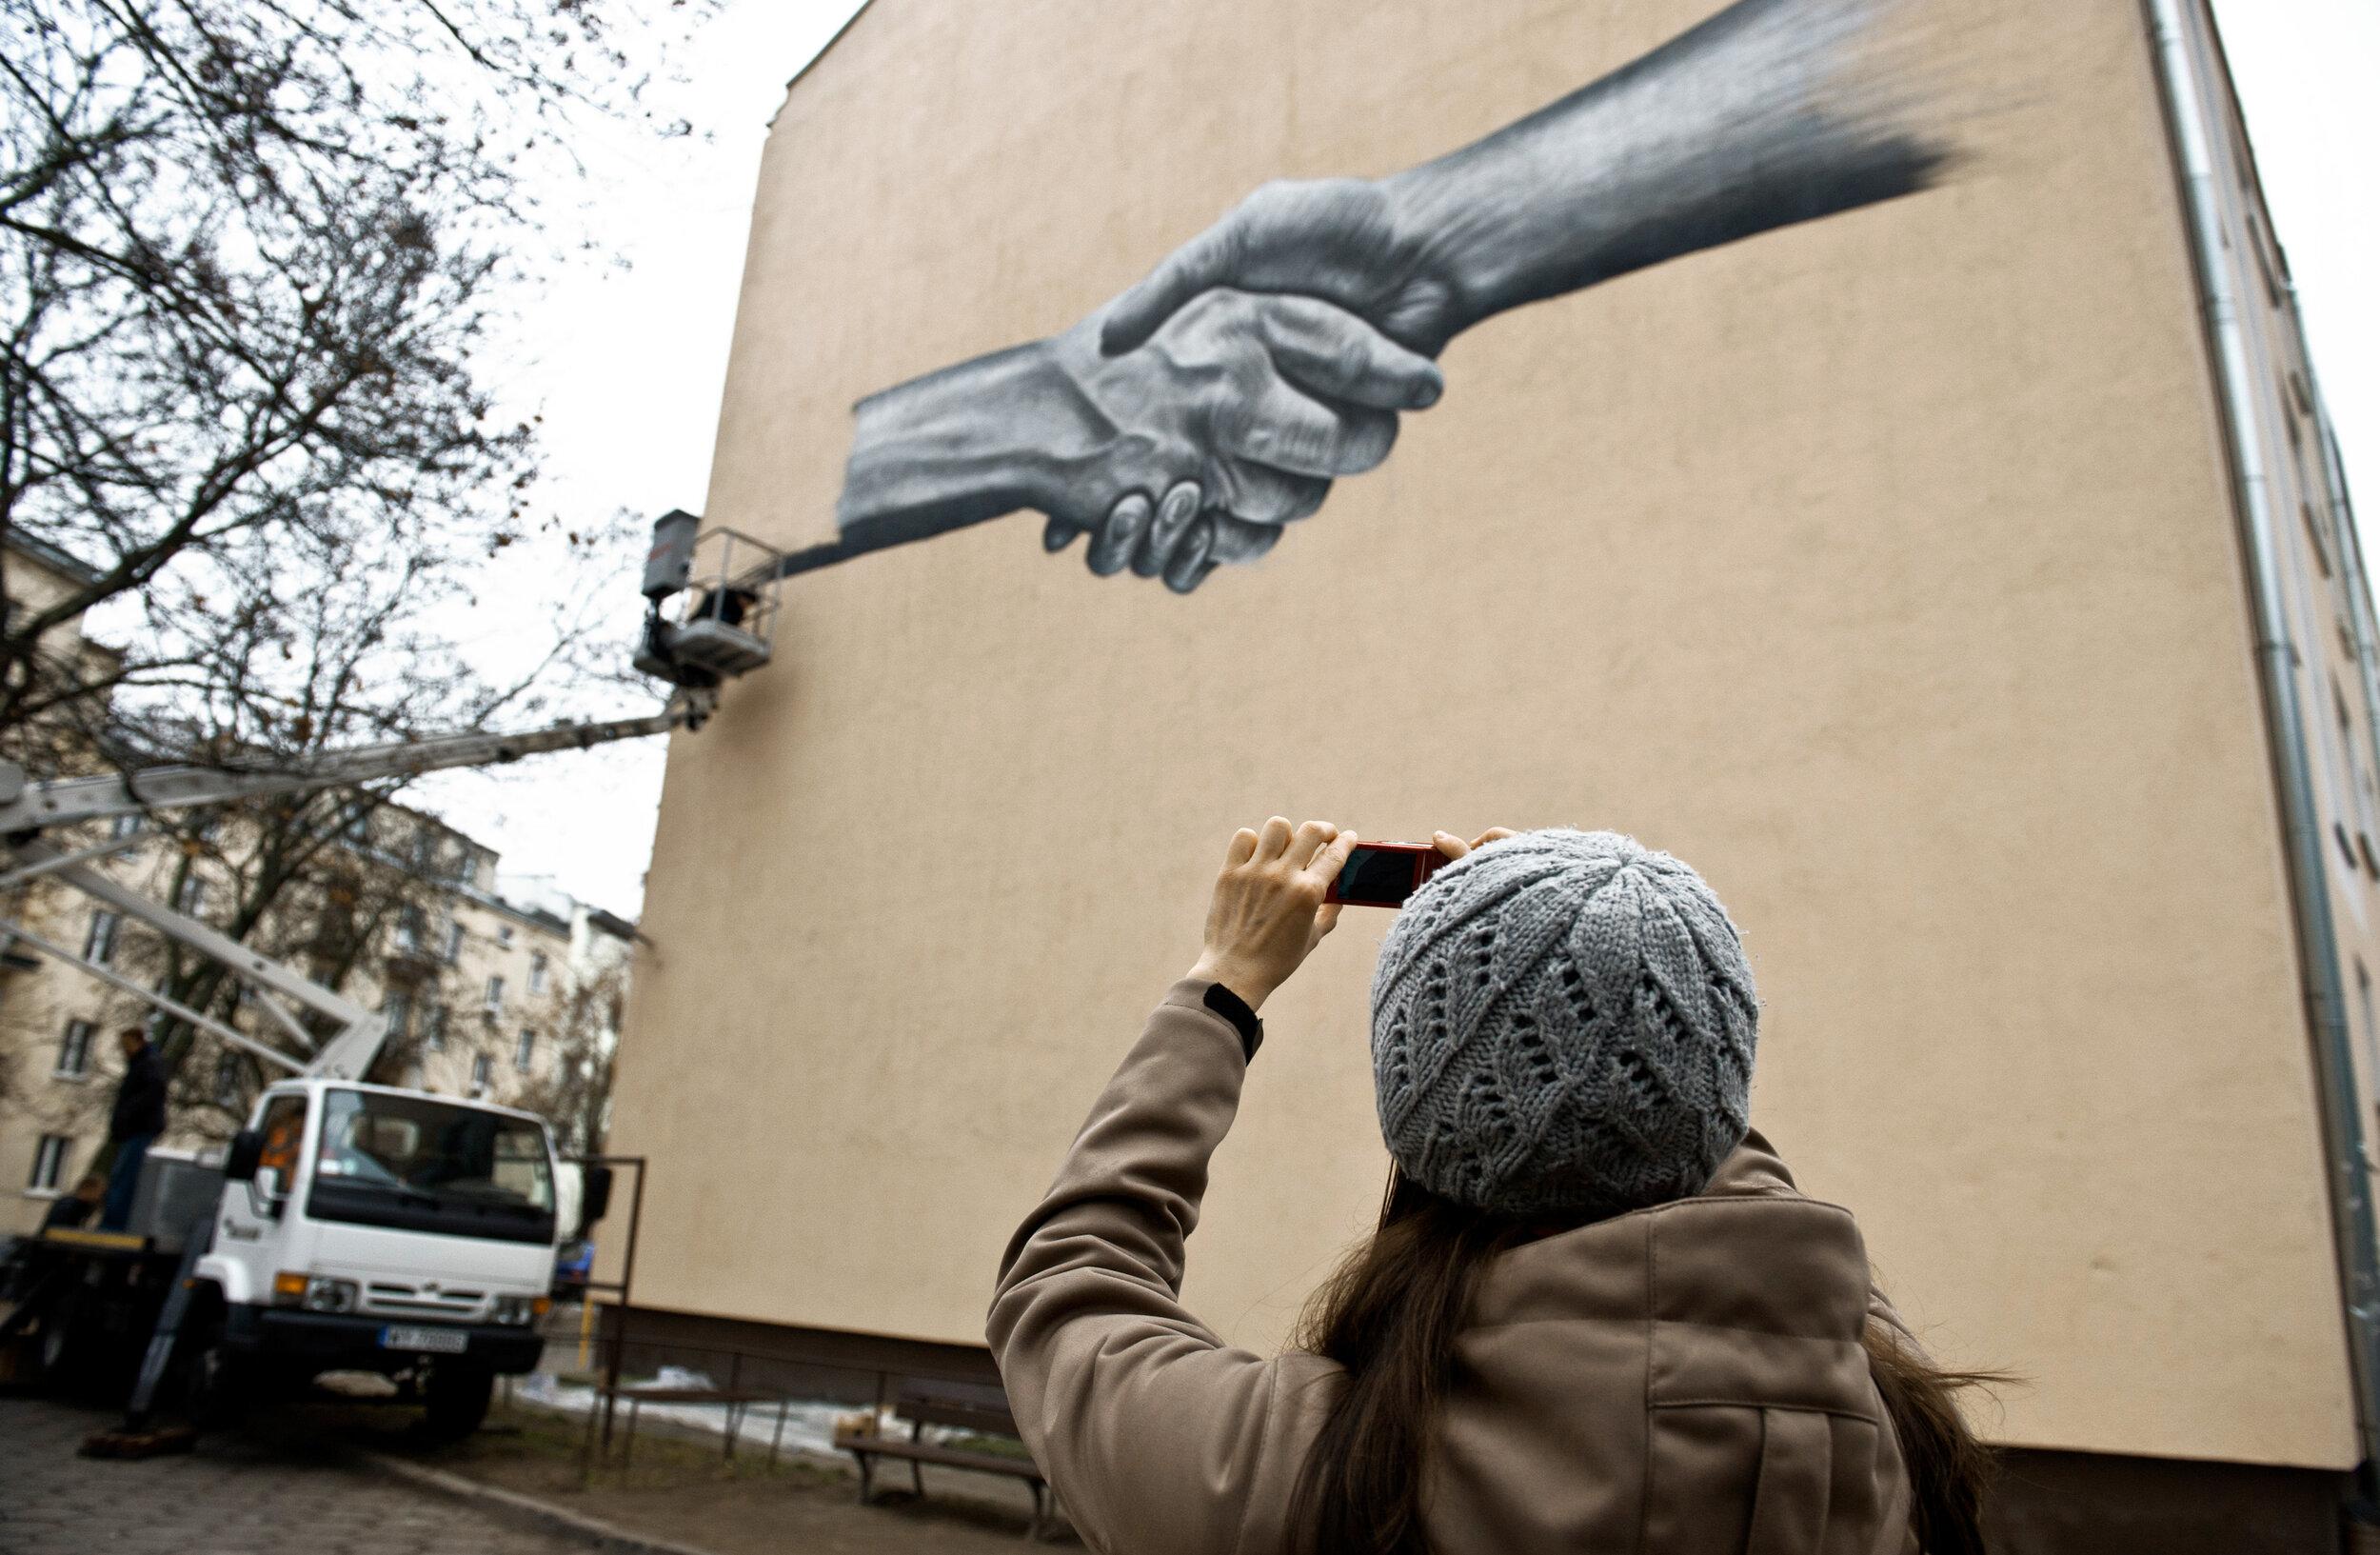 NOIR artist - Mural - Warsaw, Poland (5).jpg